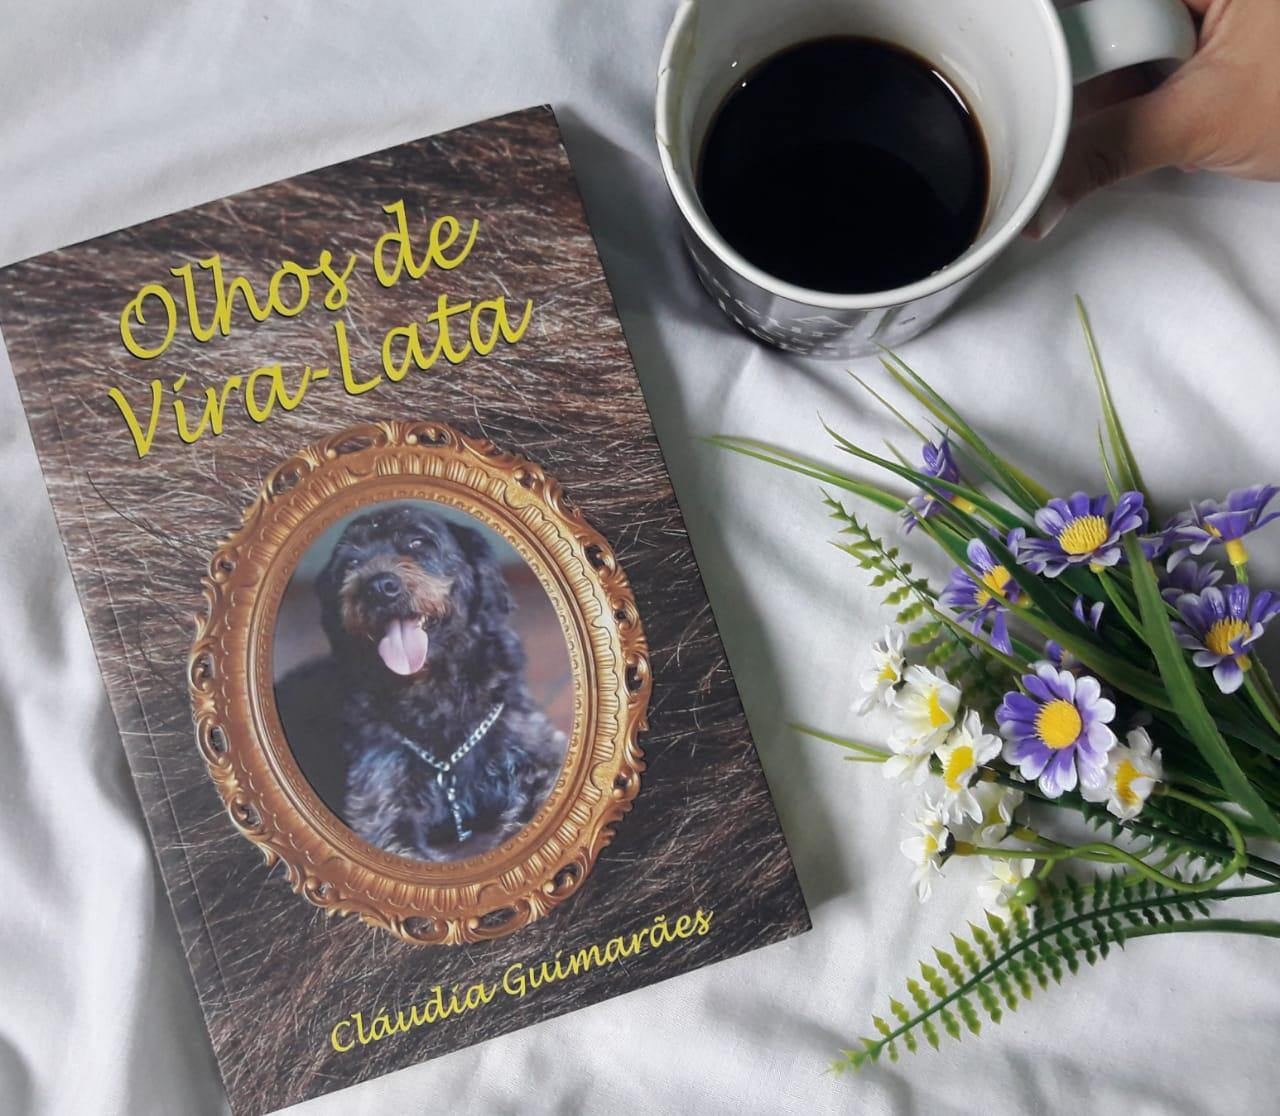 Olhos de Vira-Lata - Cláudia Guimarães